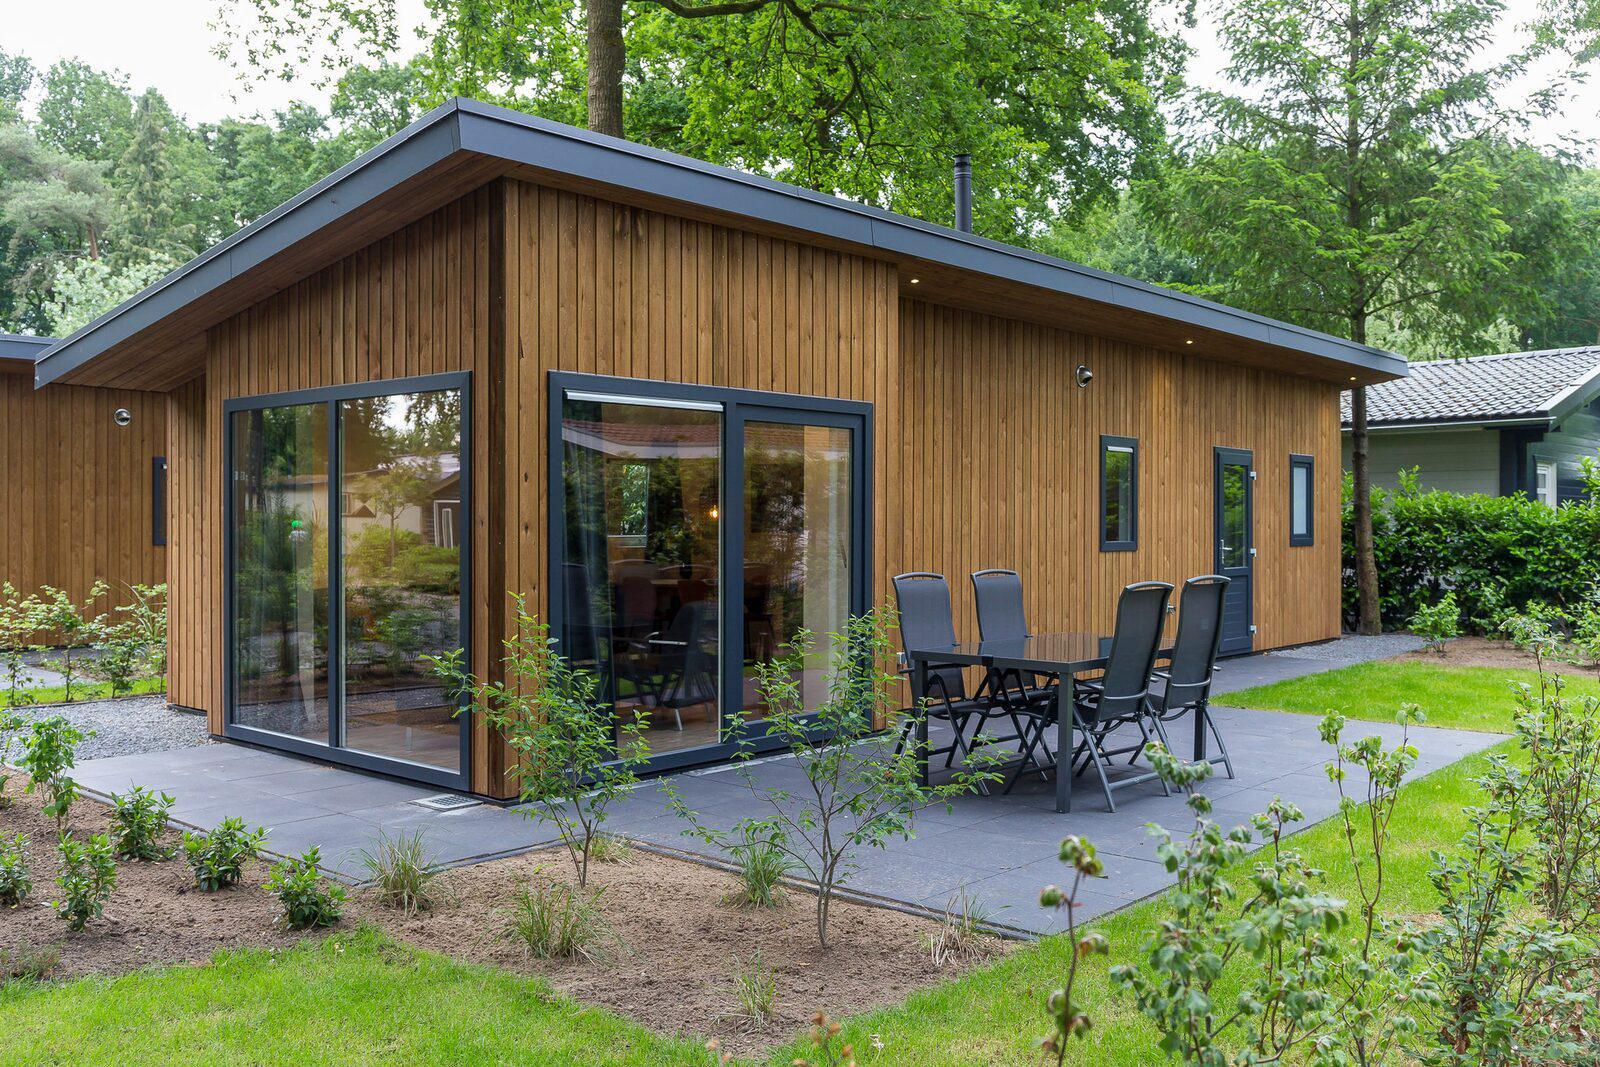 Wood Lodge Eco 4 personen